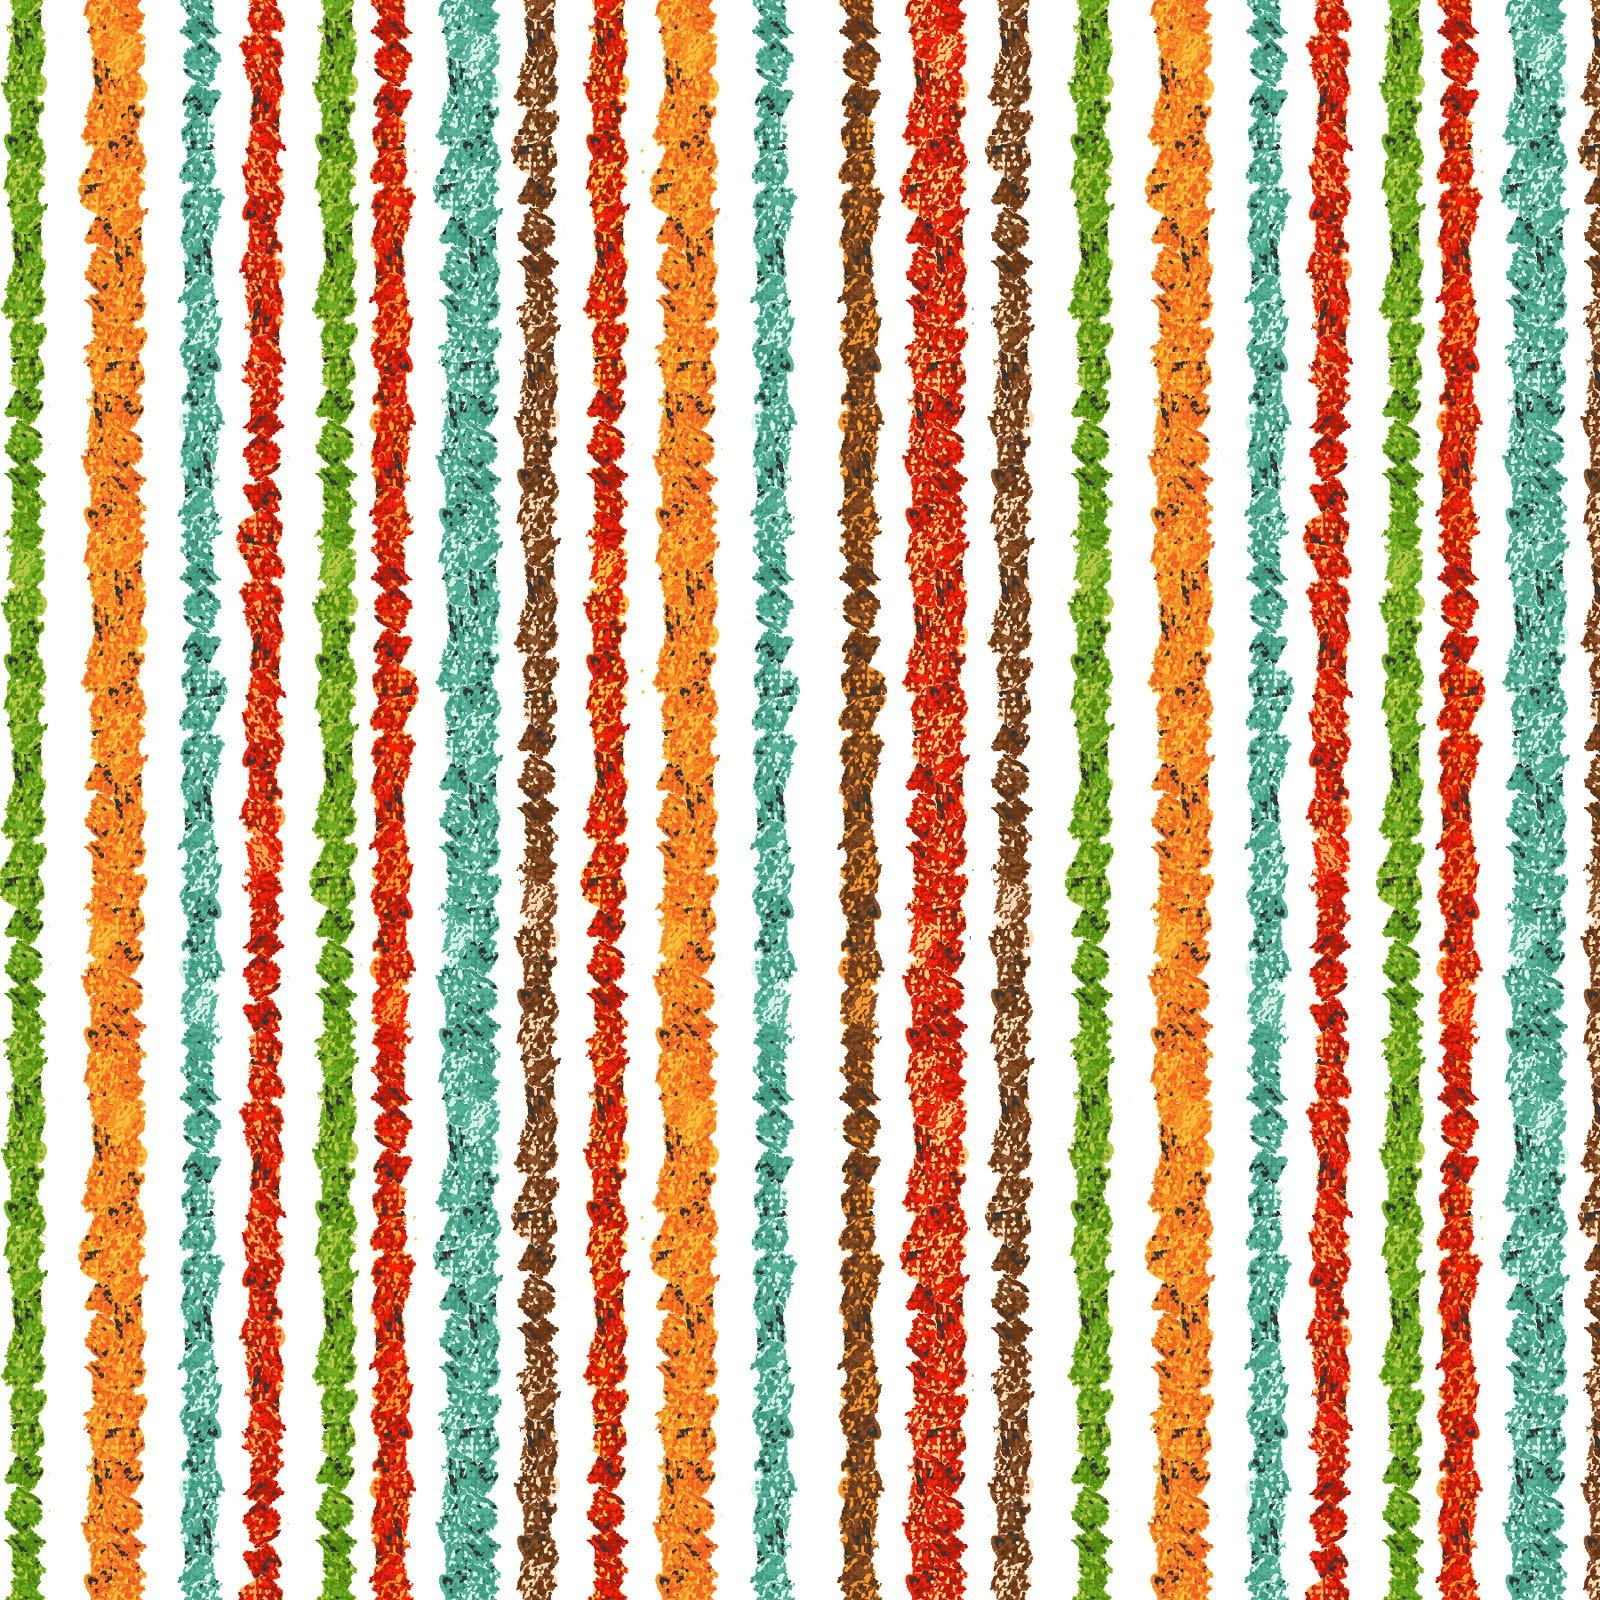 Playful Cuties IV Flannel - Safari Stripe 14925 Multi